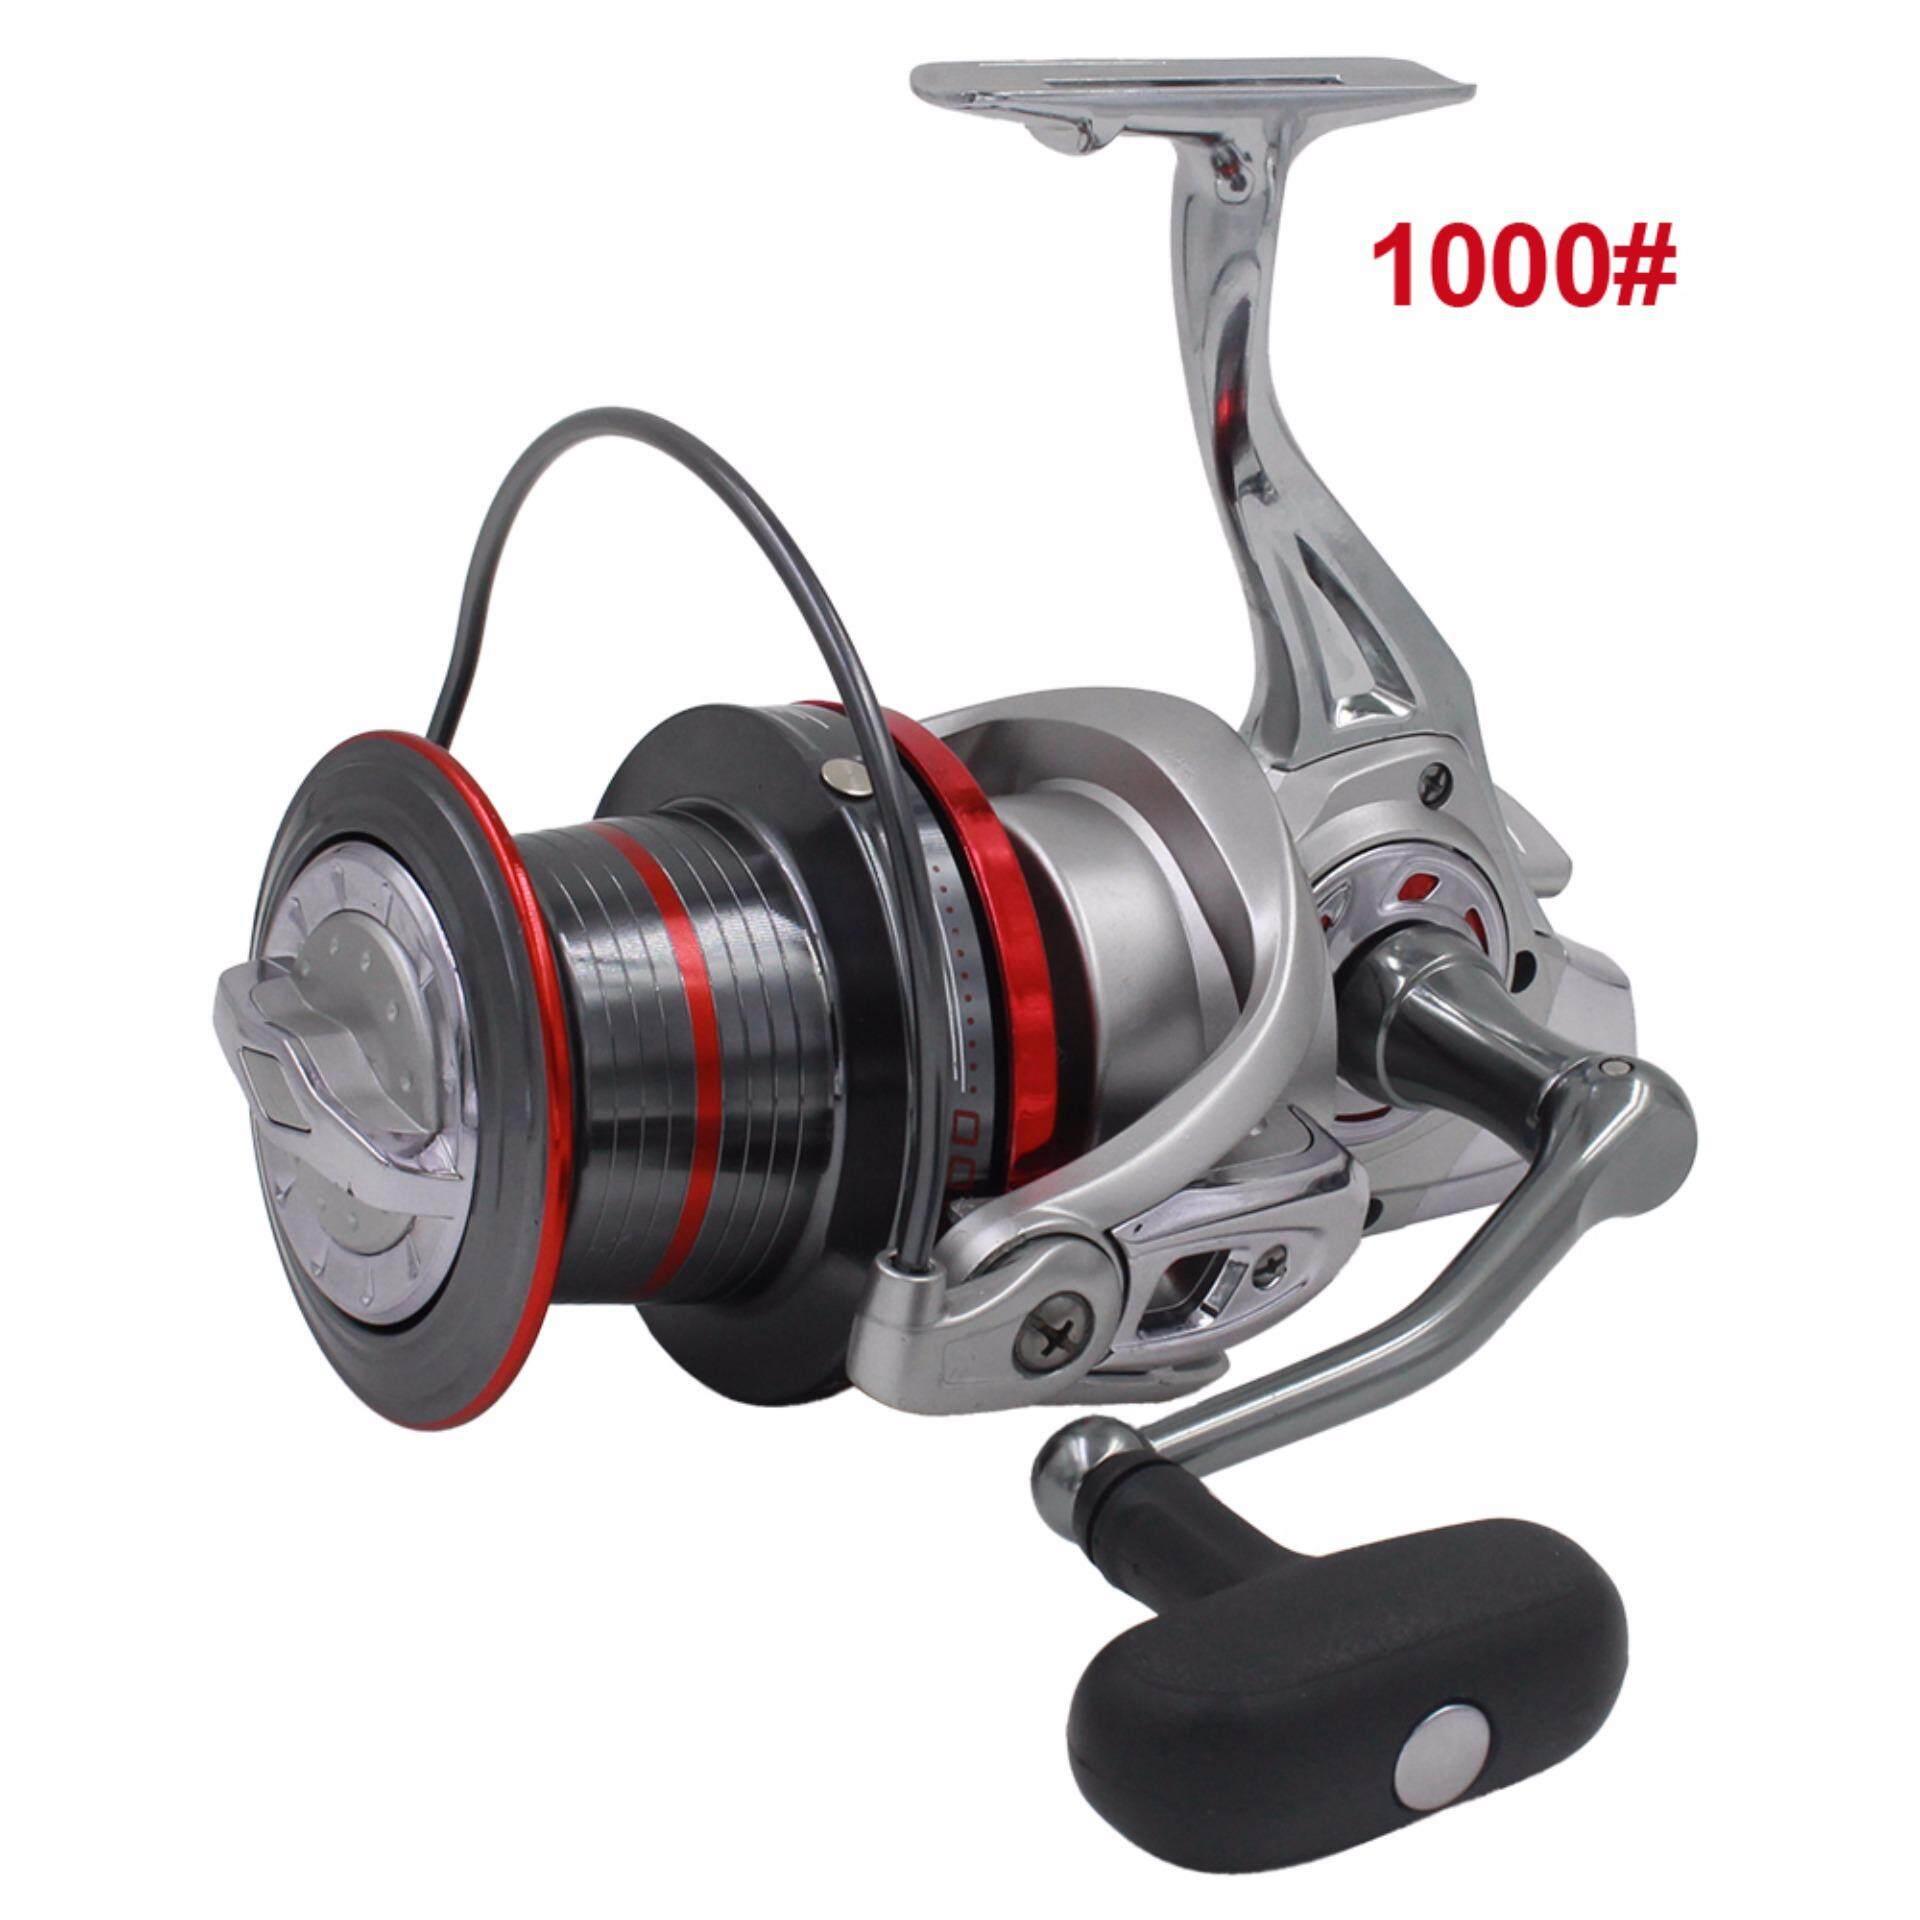 ... 1 Source · DF1000 Keemasan Kincir Berputar Penangkapan Ikan Gulung Source Rp 785 067 3 Color FDDL Durable